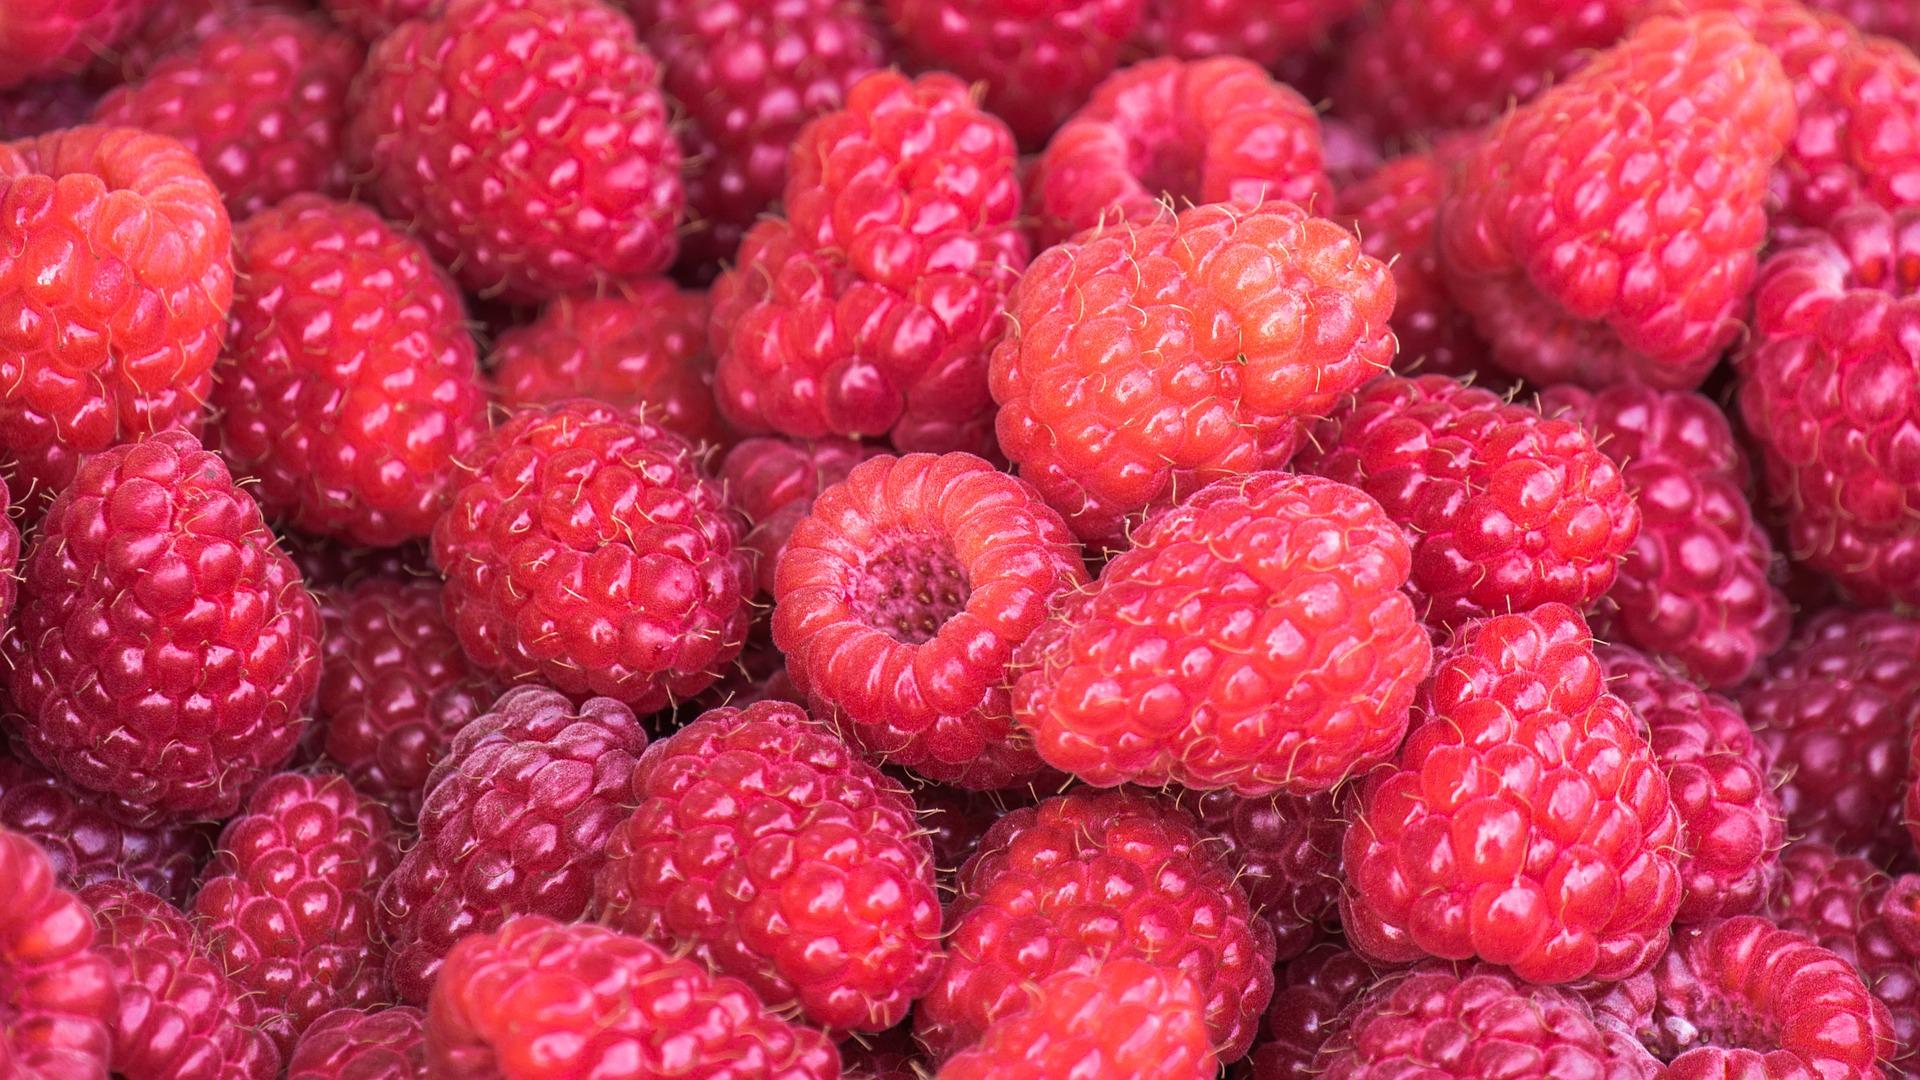 raspberries-3583005_1920